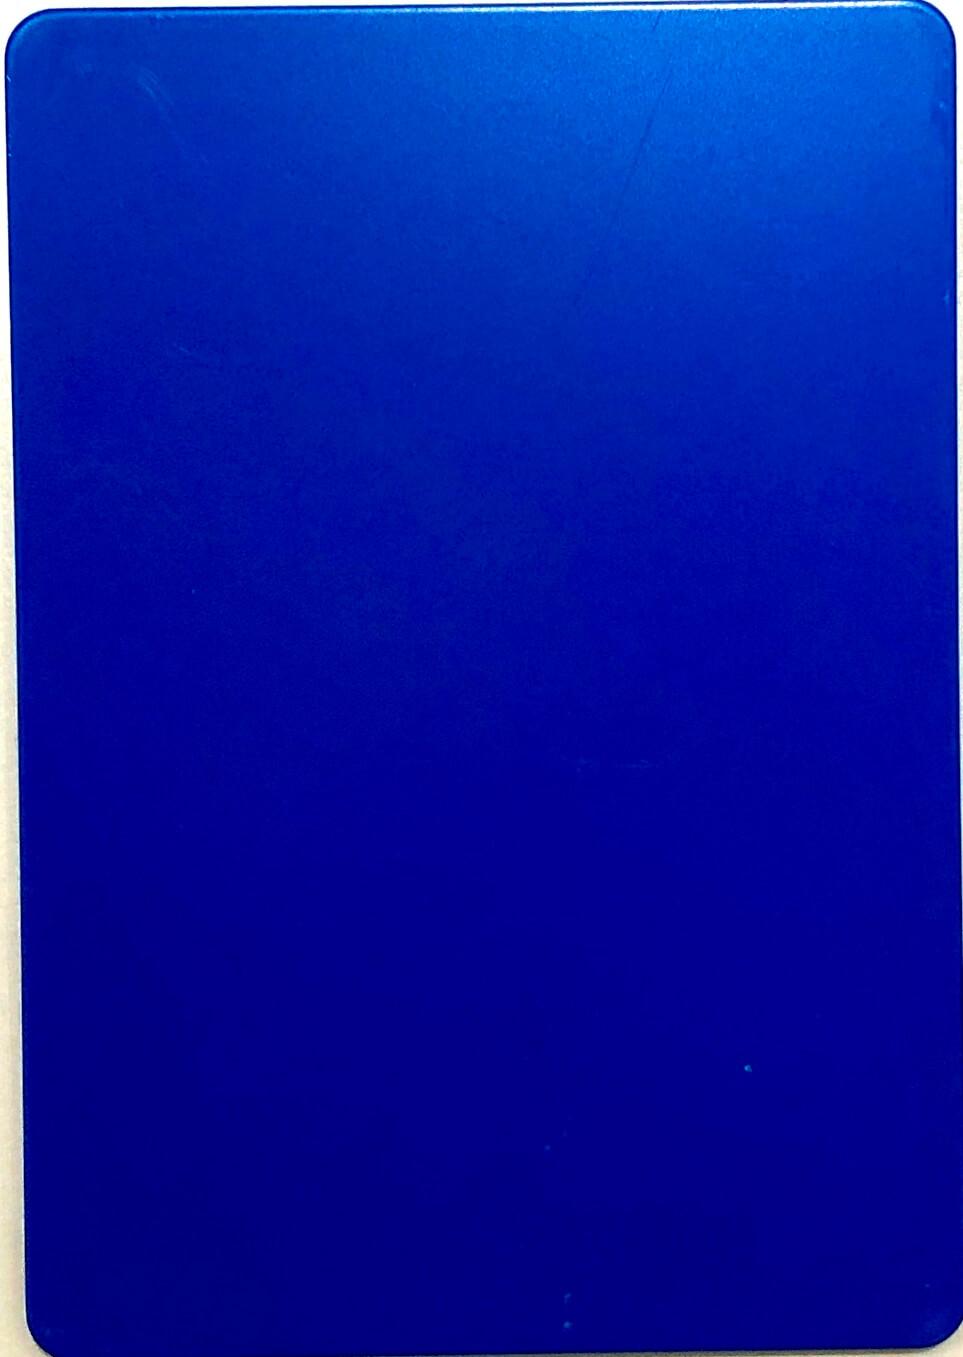 LIGHT BLUE Image